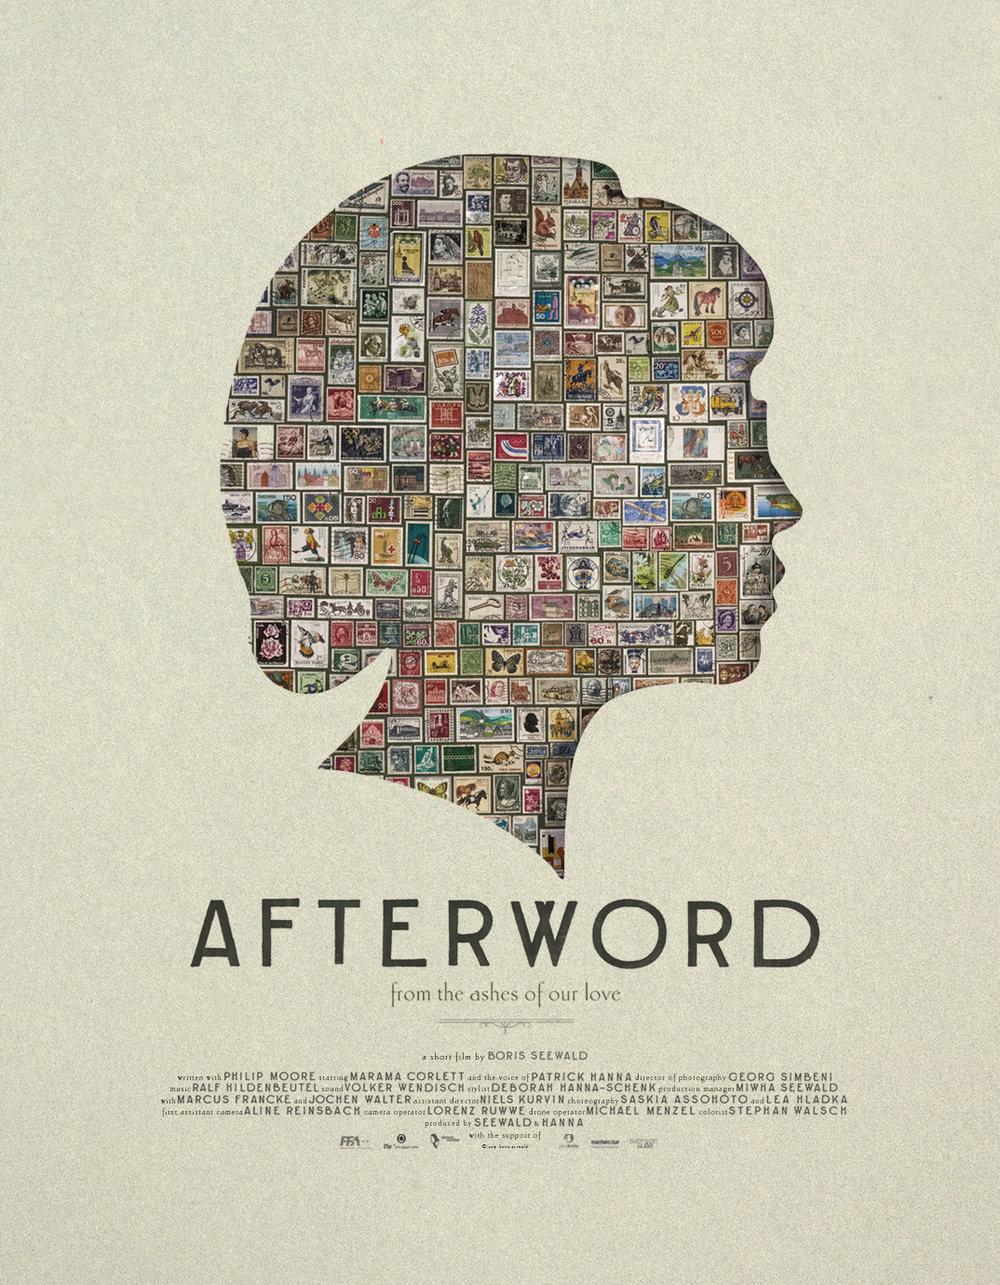 afterword poster.jpg